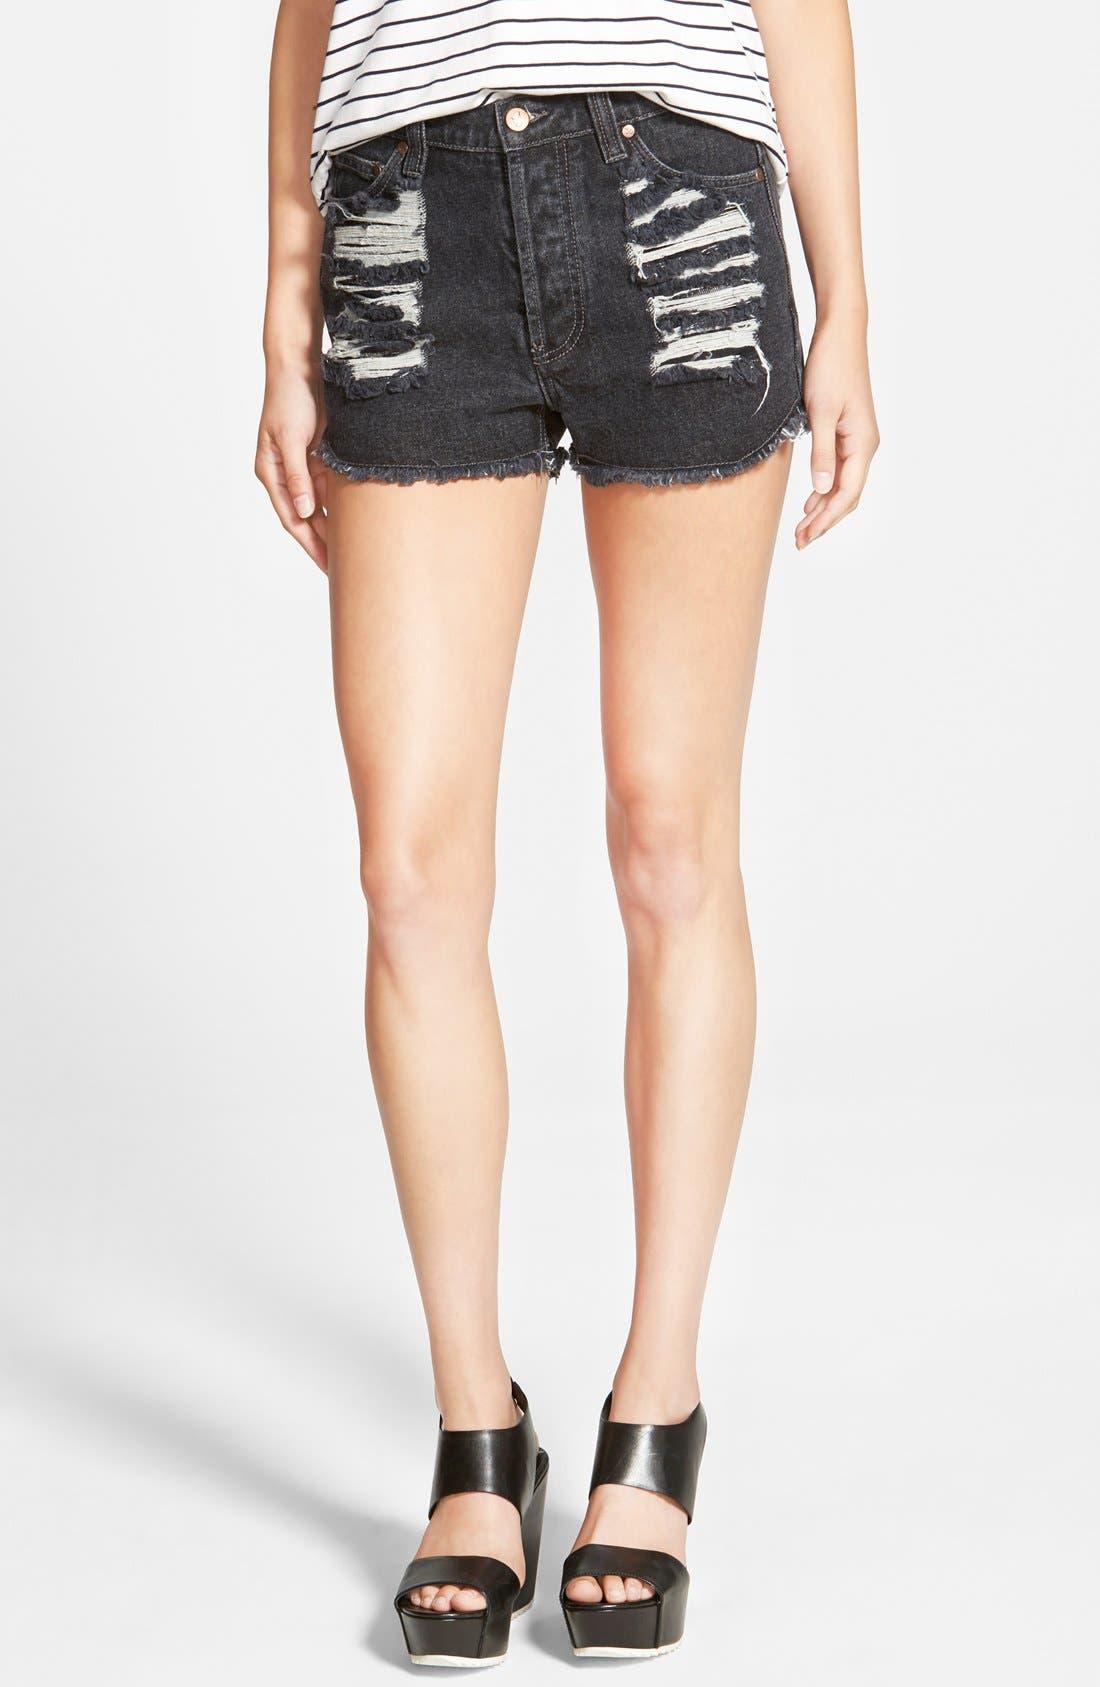 Alternate Image 1 Selected - MINKPINK 'Brittle Hearts Slasher' Cutoff Shorts (Black)